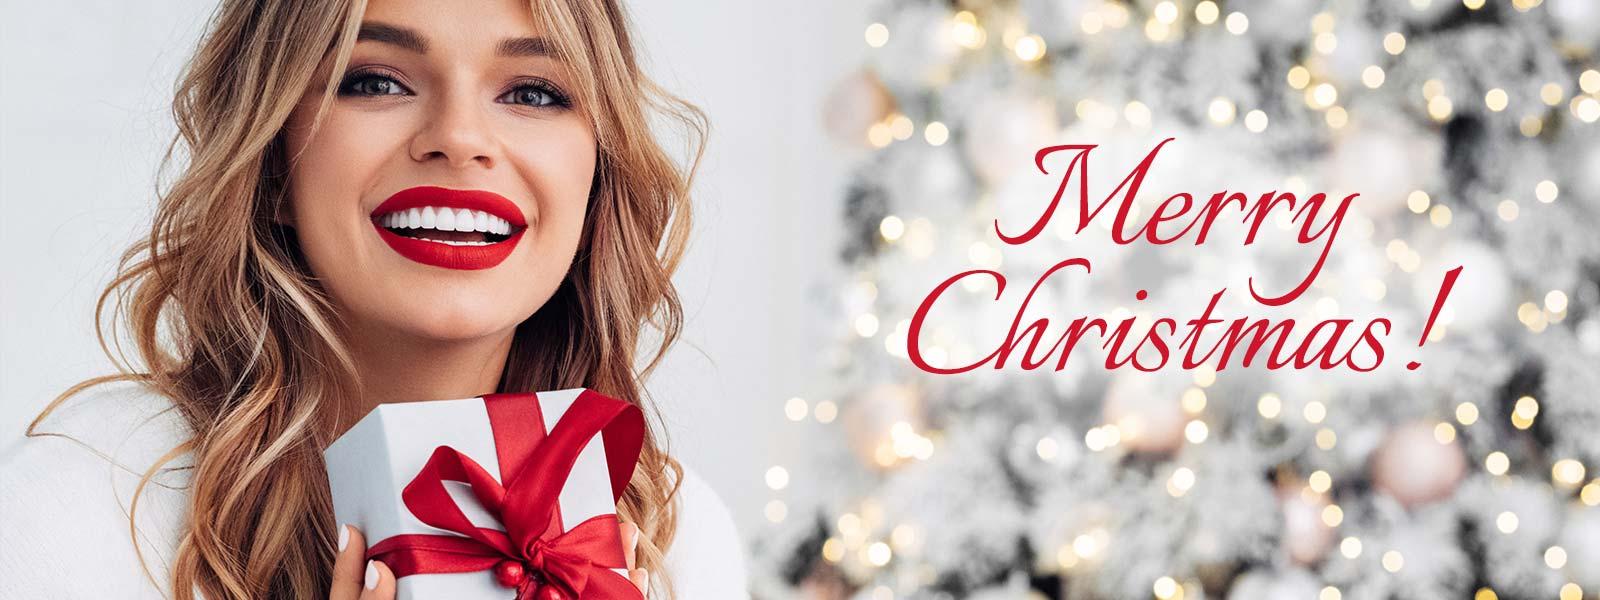 Merry Christmas-01